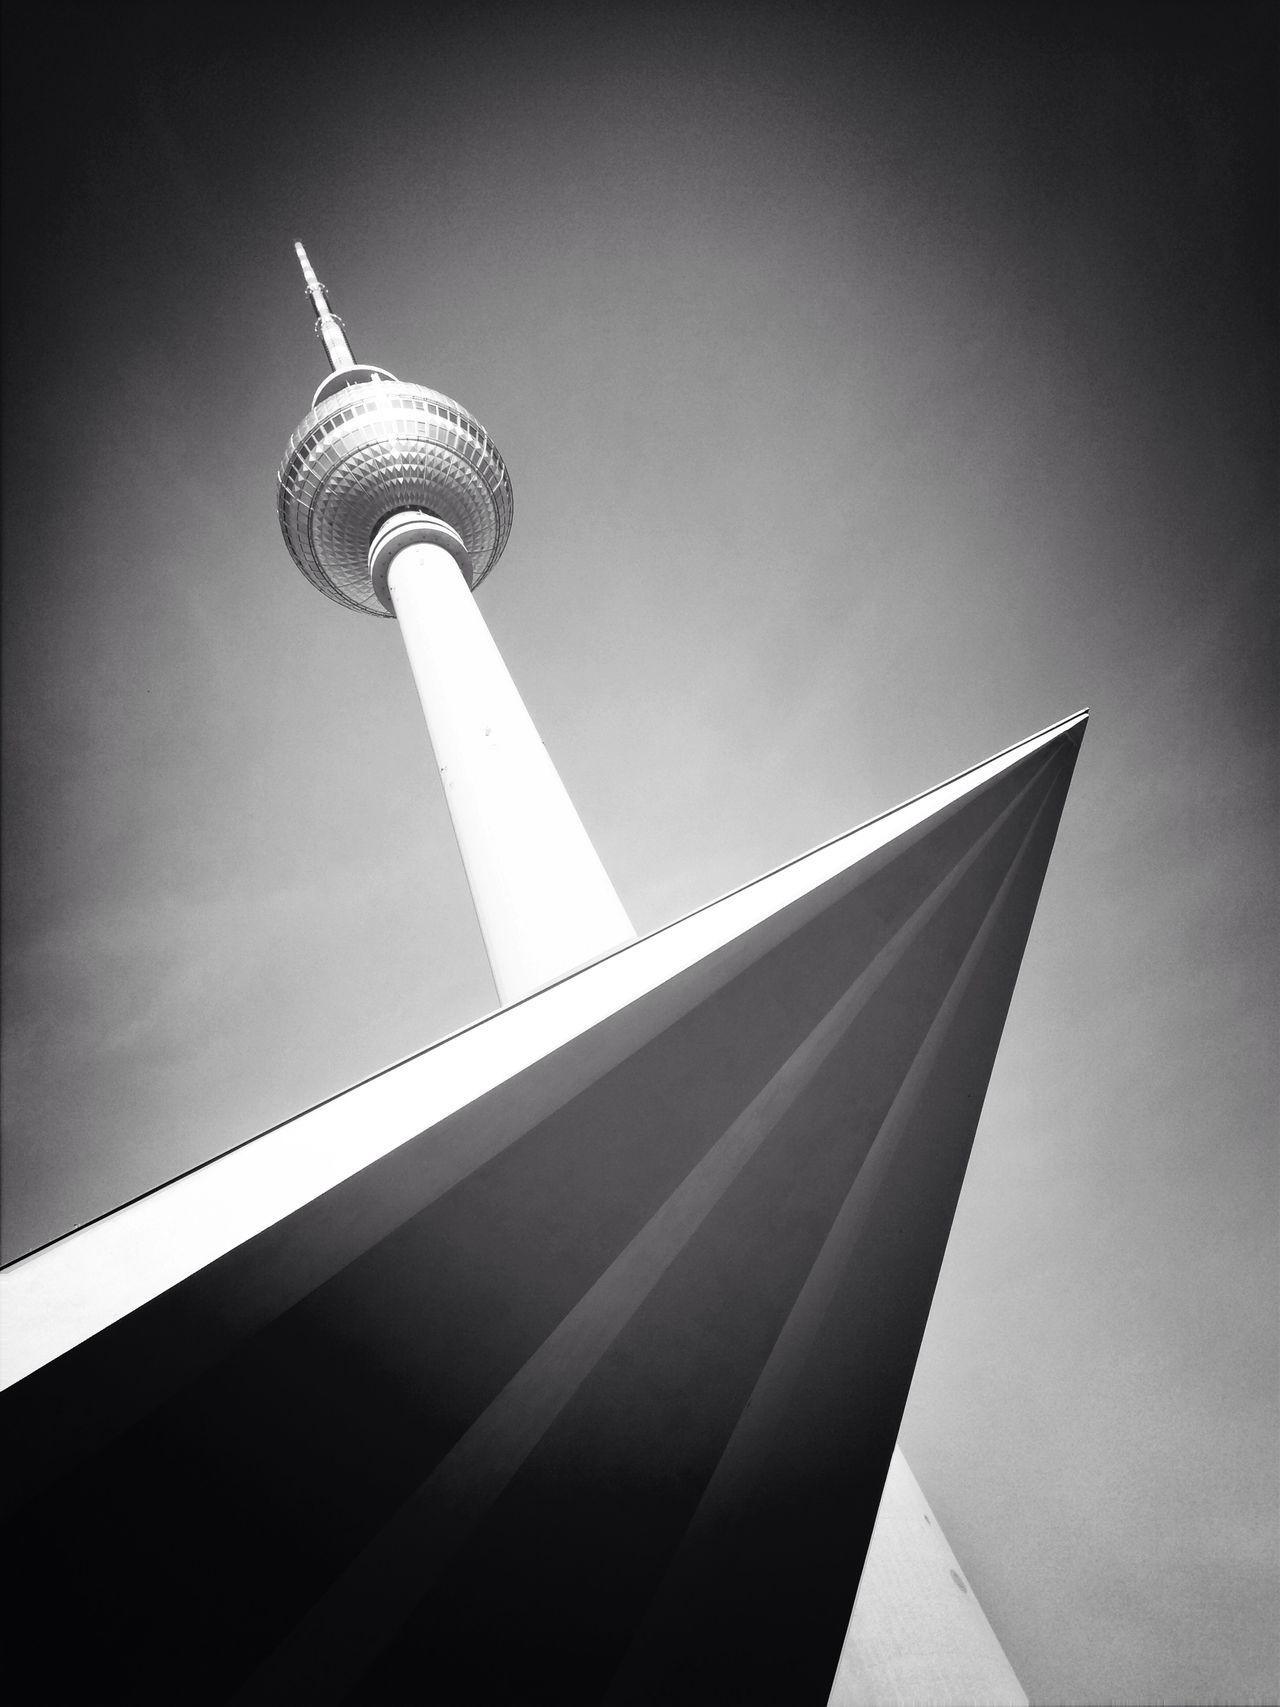 Perspective Architecture Minimalism Black & White